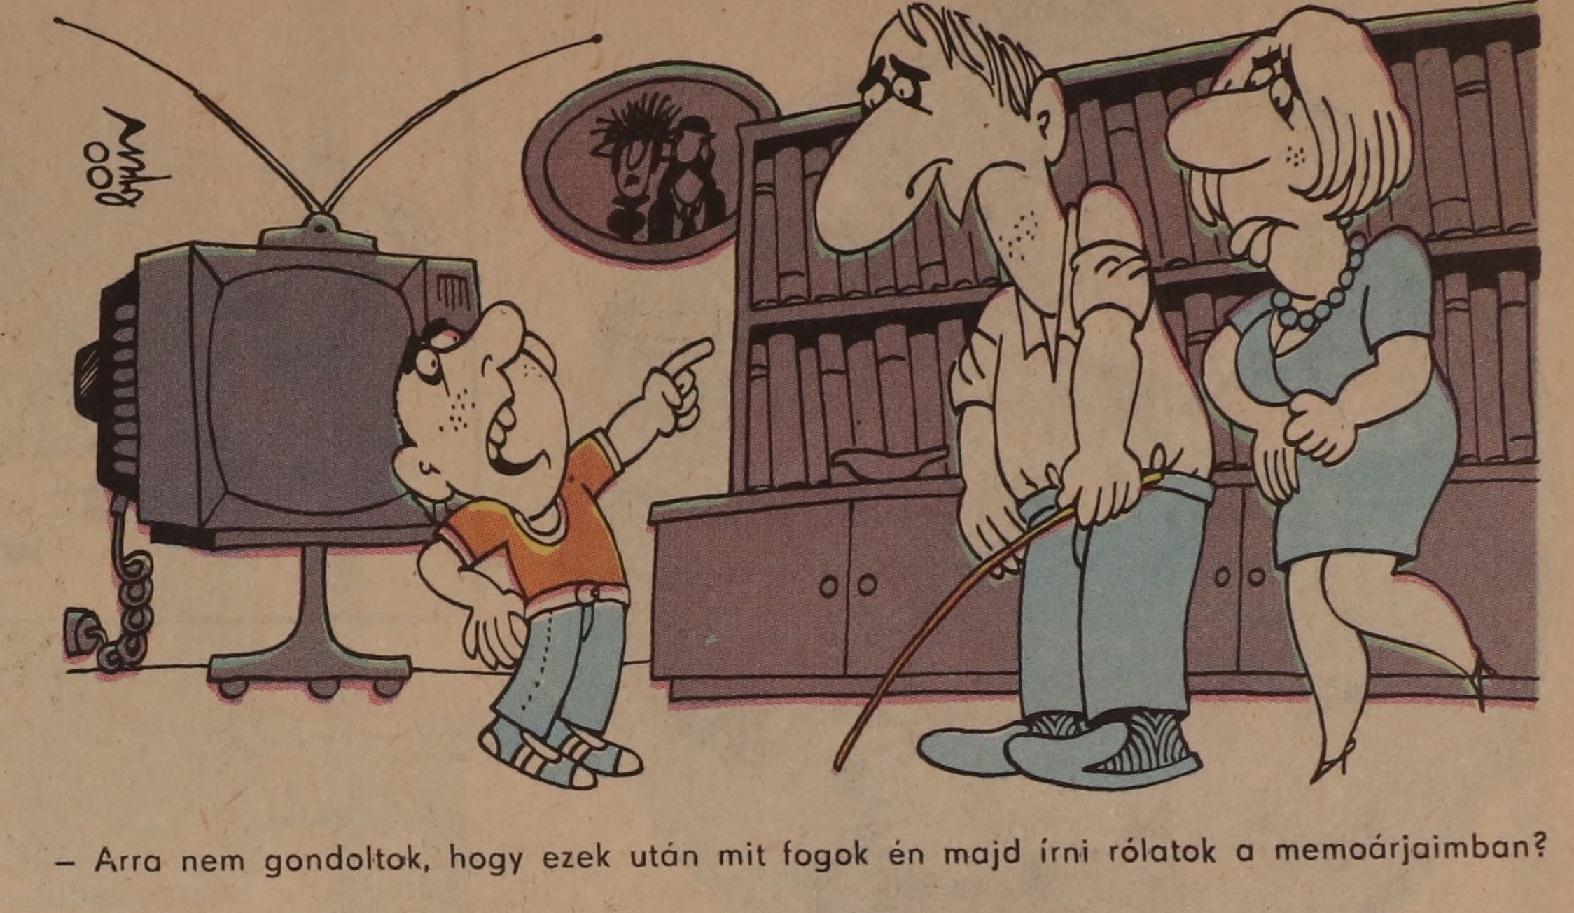 idokapszula_nb_i_1983_84_magyarorszag_spanyolorszag_humor_4.jpg